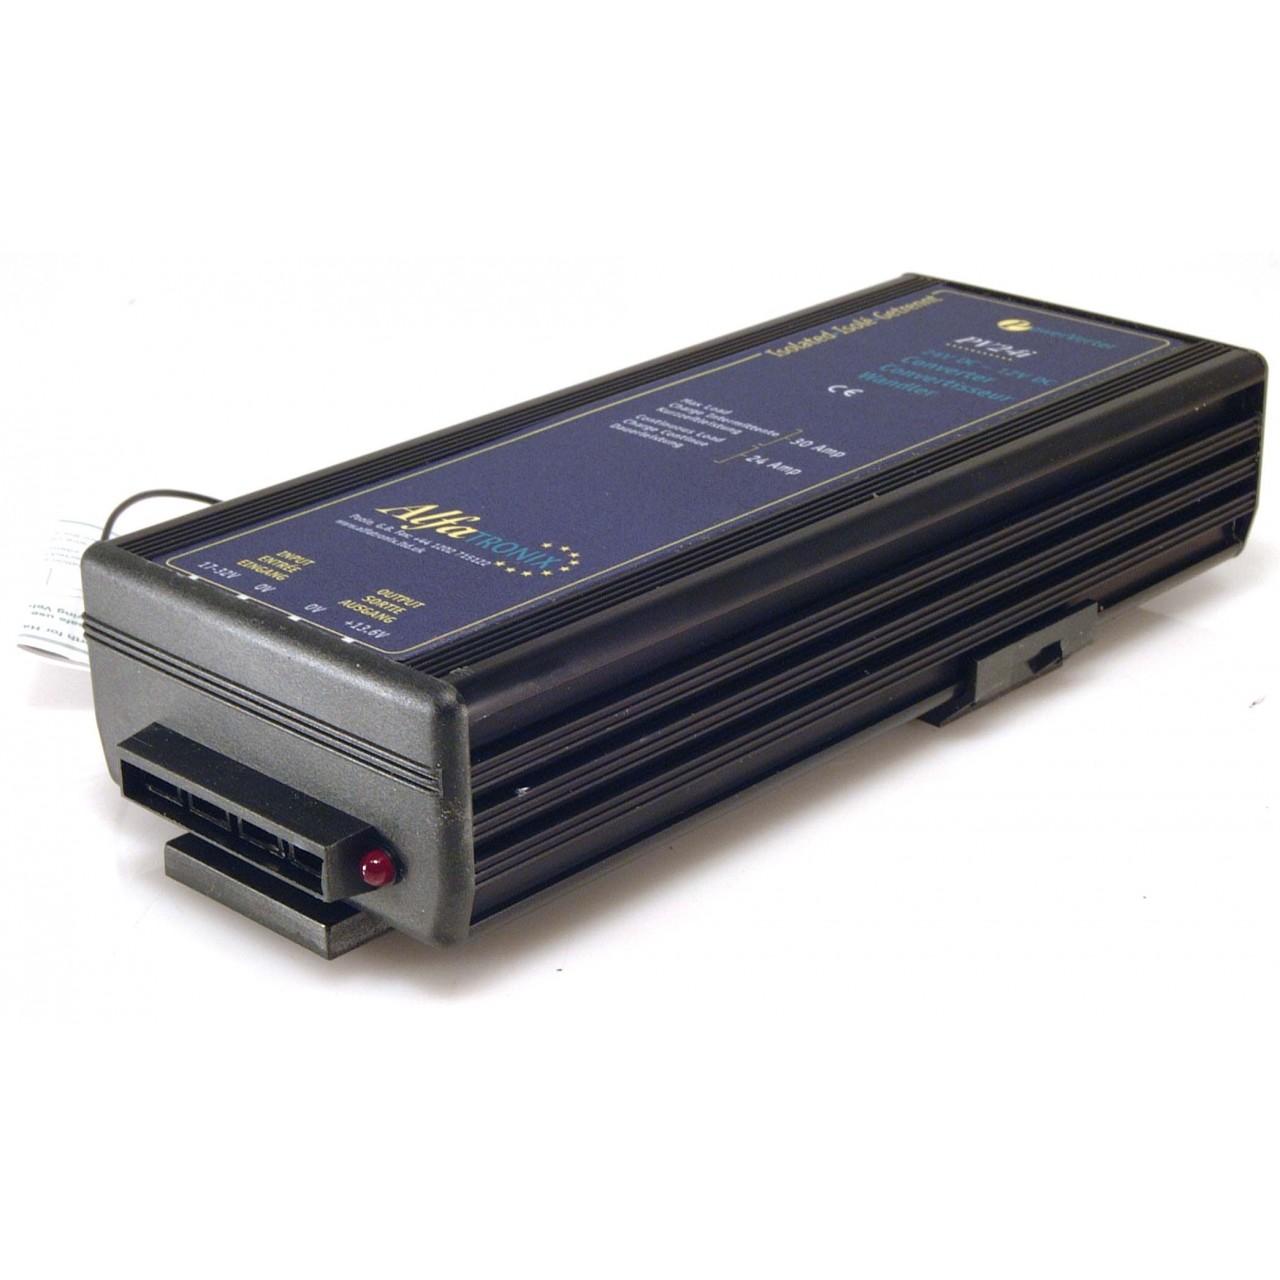 PS-PV24 Chargeurs et alimentations - ICOM